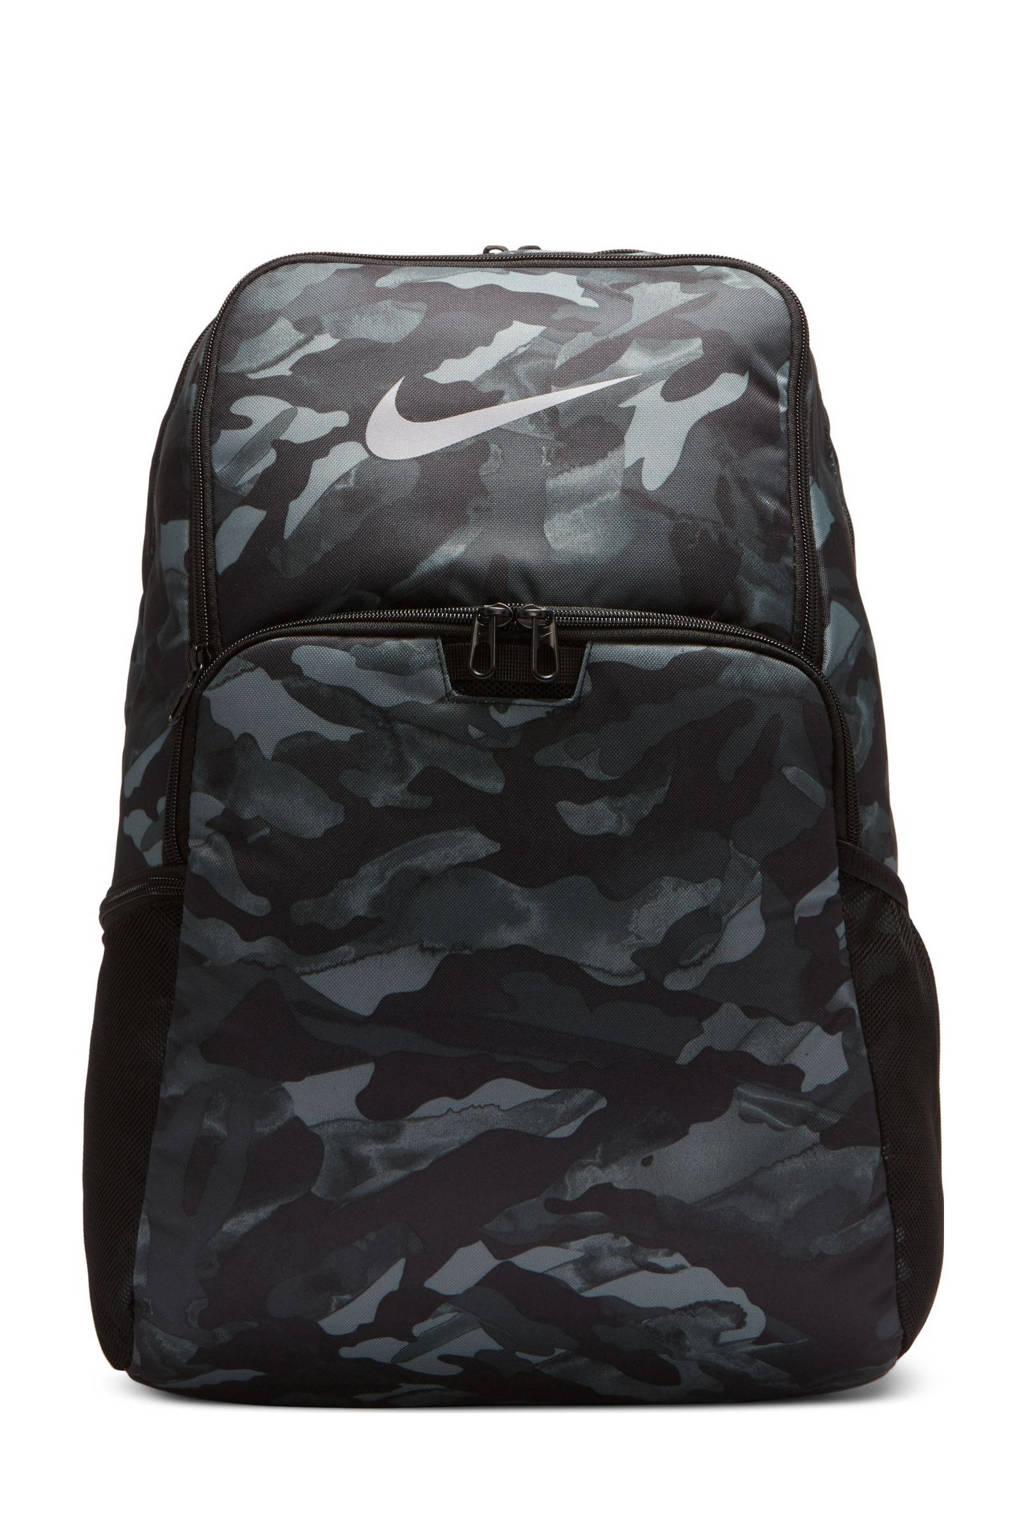 Nike   rugzak Brasilia XL zwart/grijs, Zwart/grijs